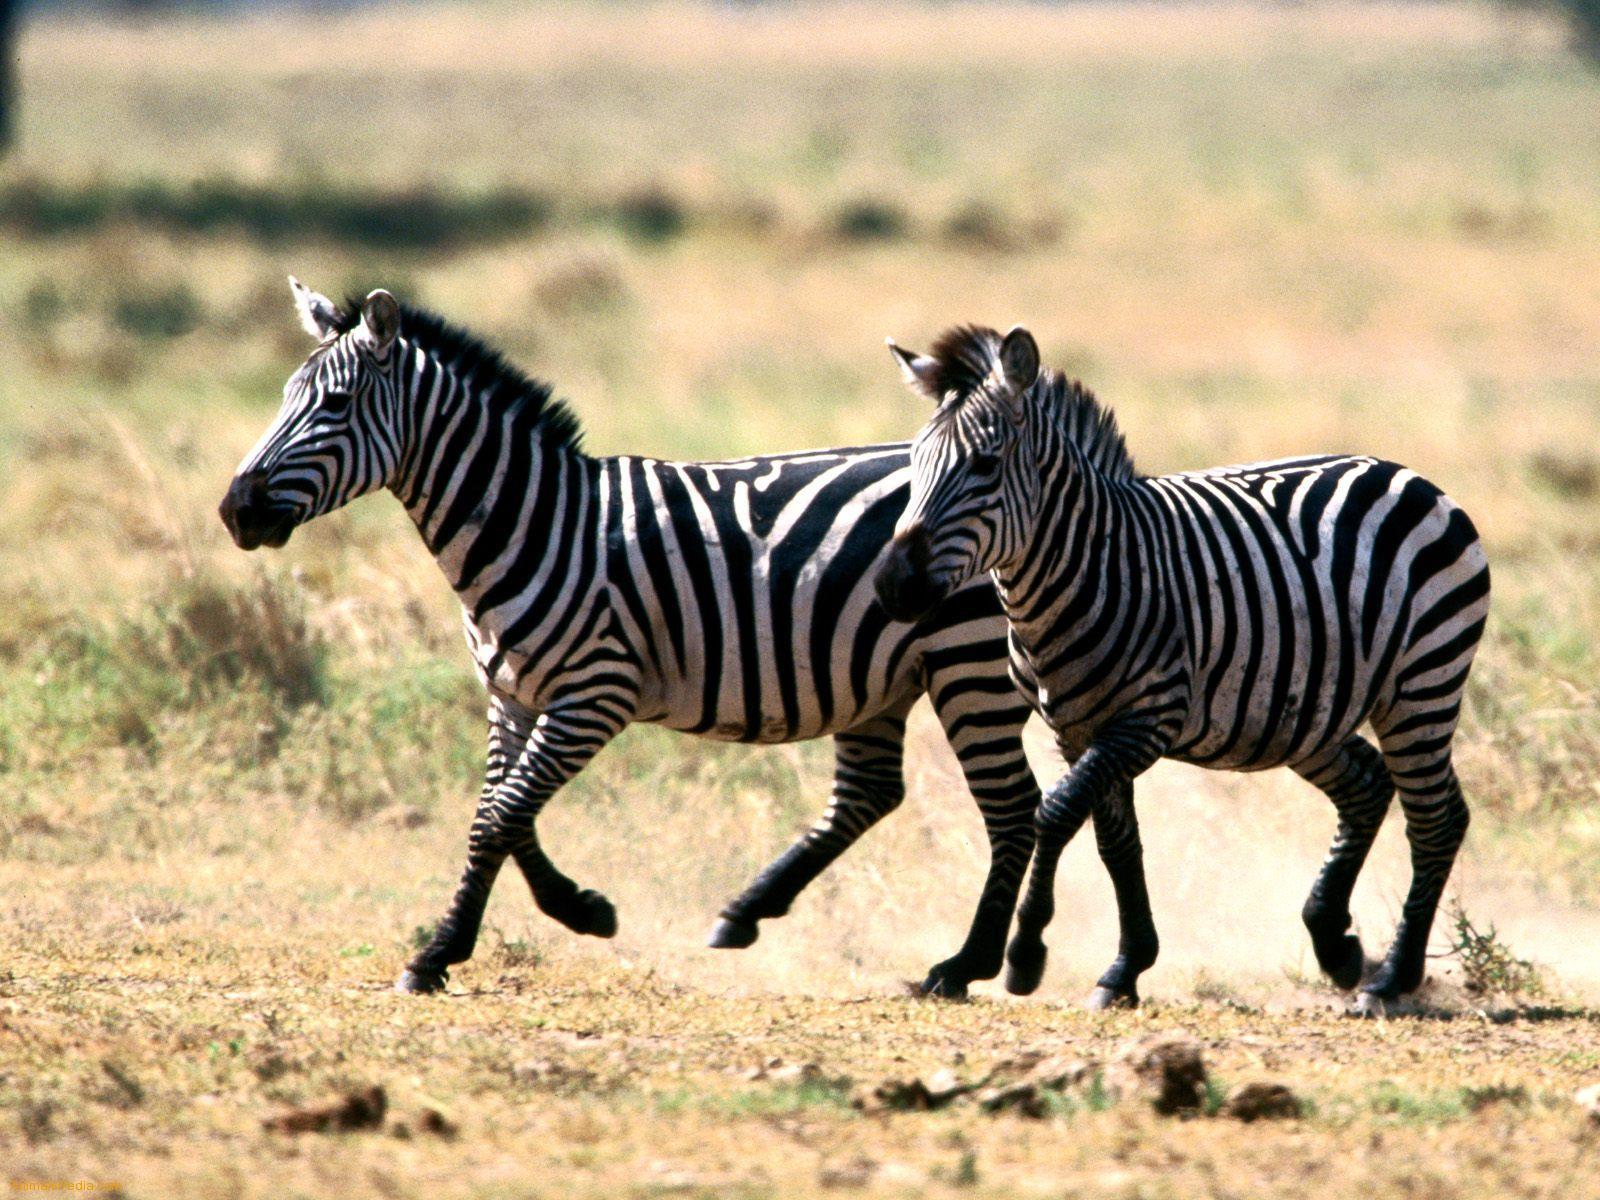 zebras animals zebra babies baby wild dangerous animal behavior strong mountain together zebres encyclopaedia many burchell